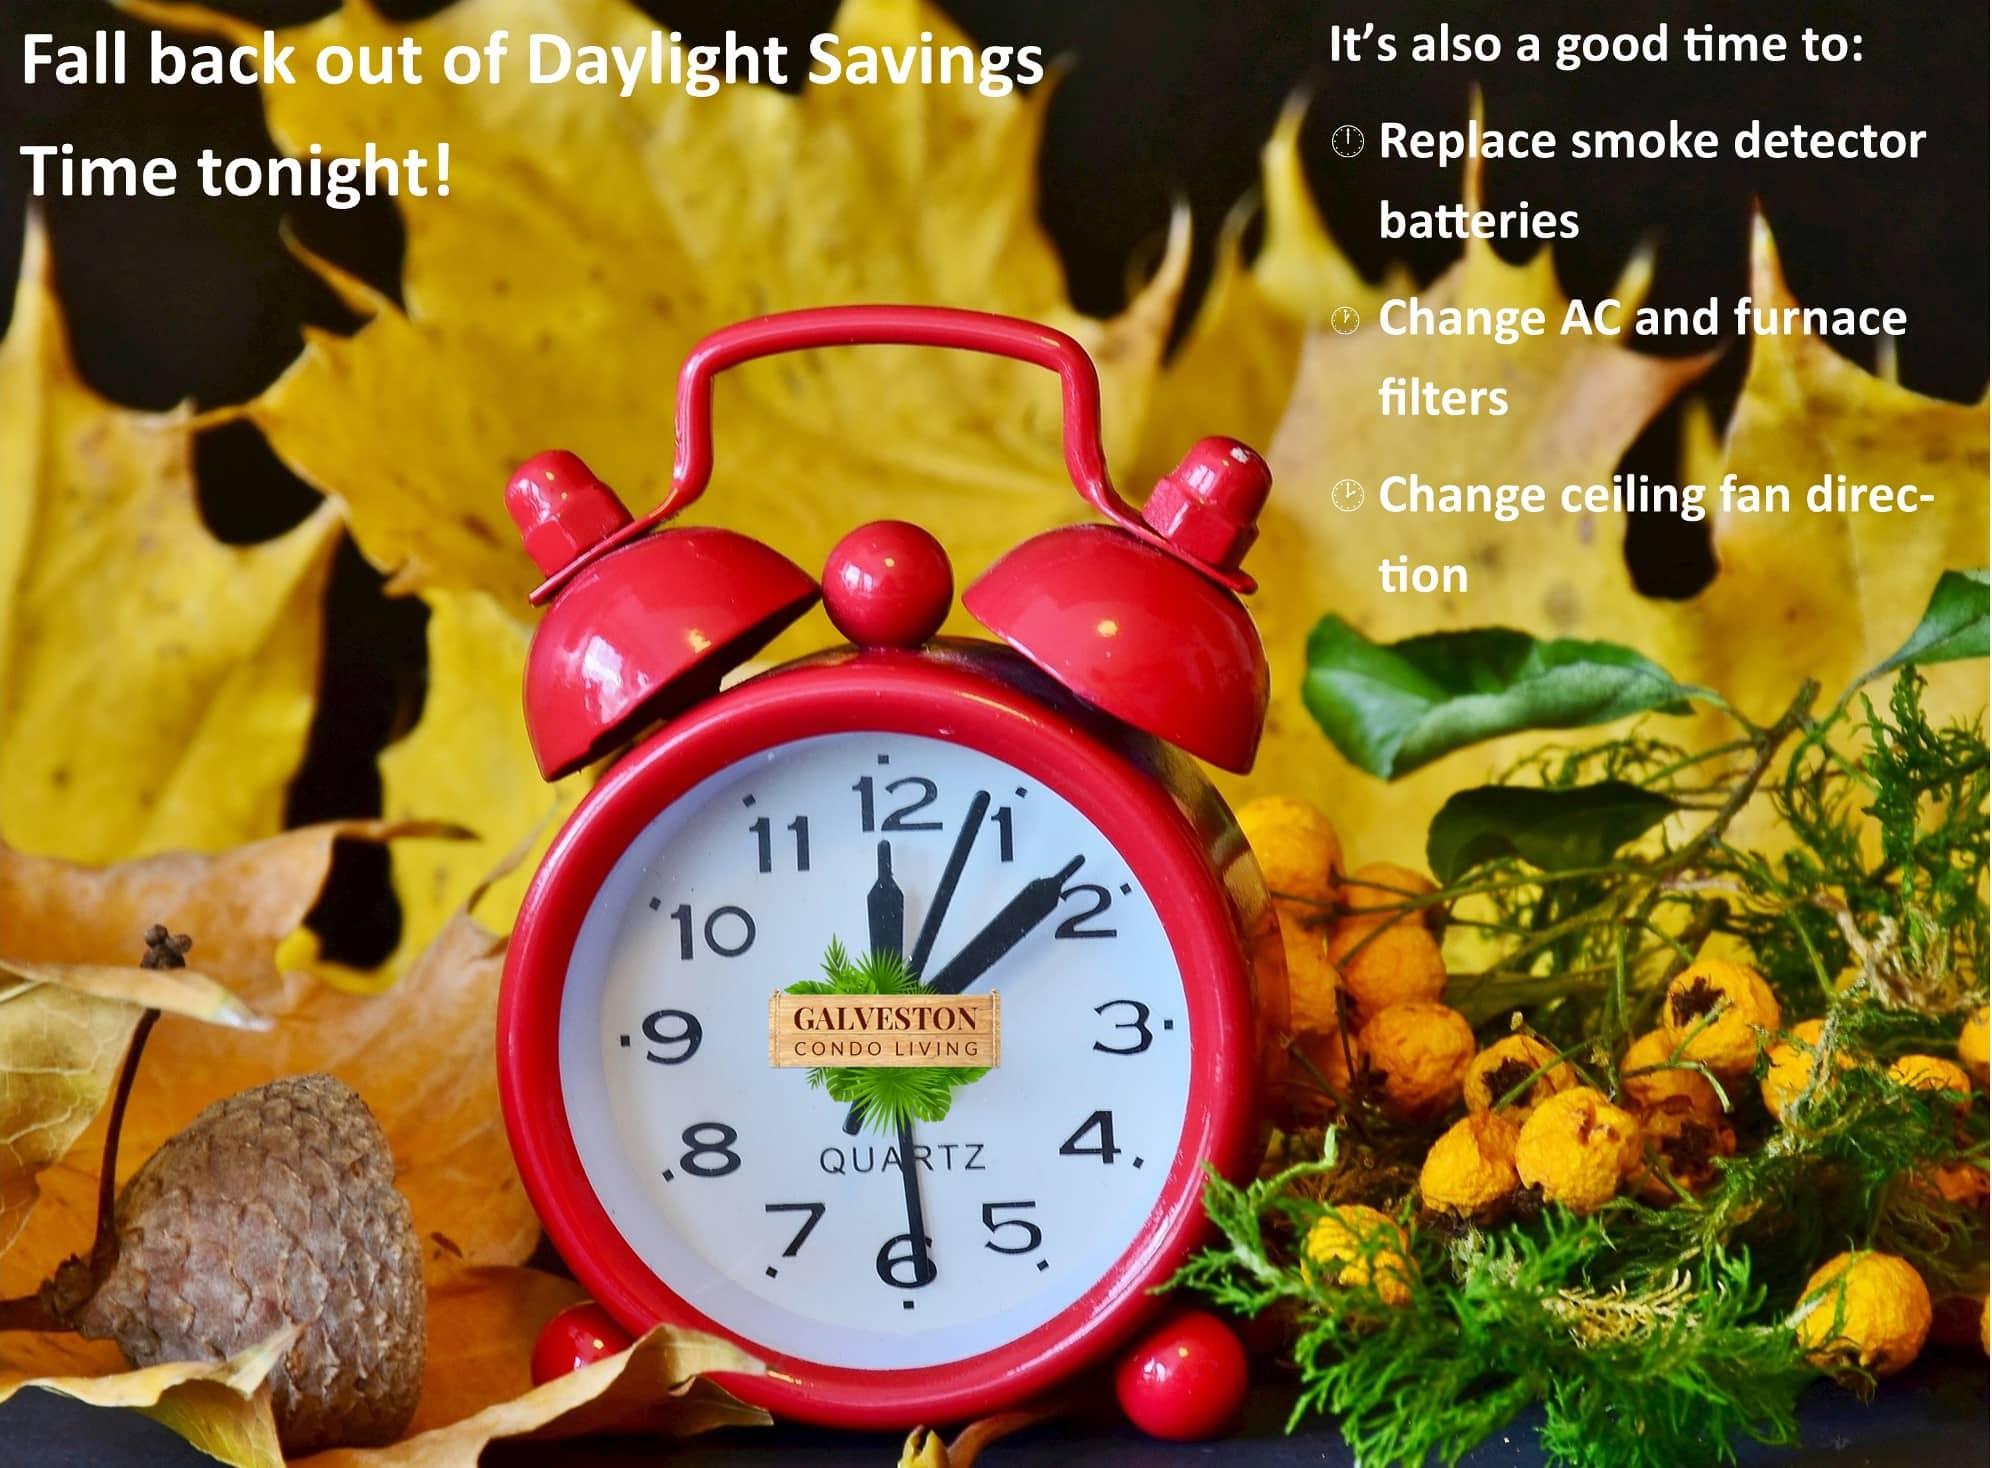 Daylight savings time ends reminder